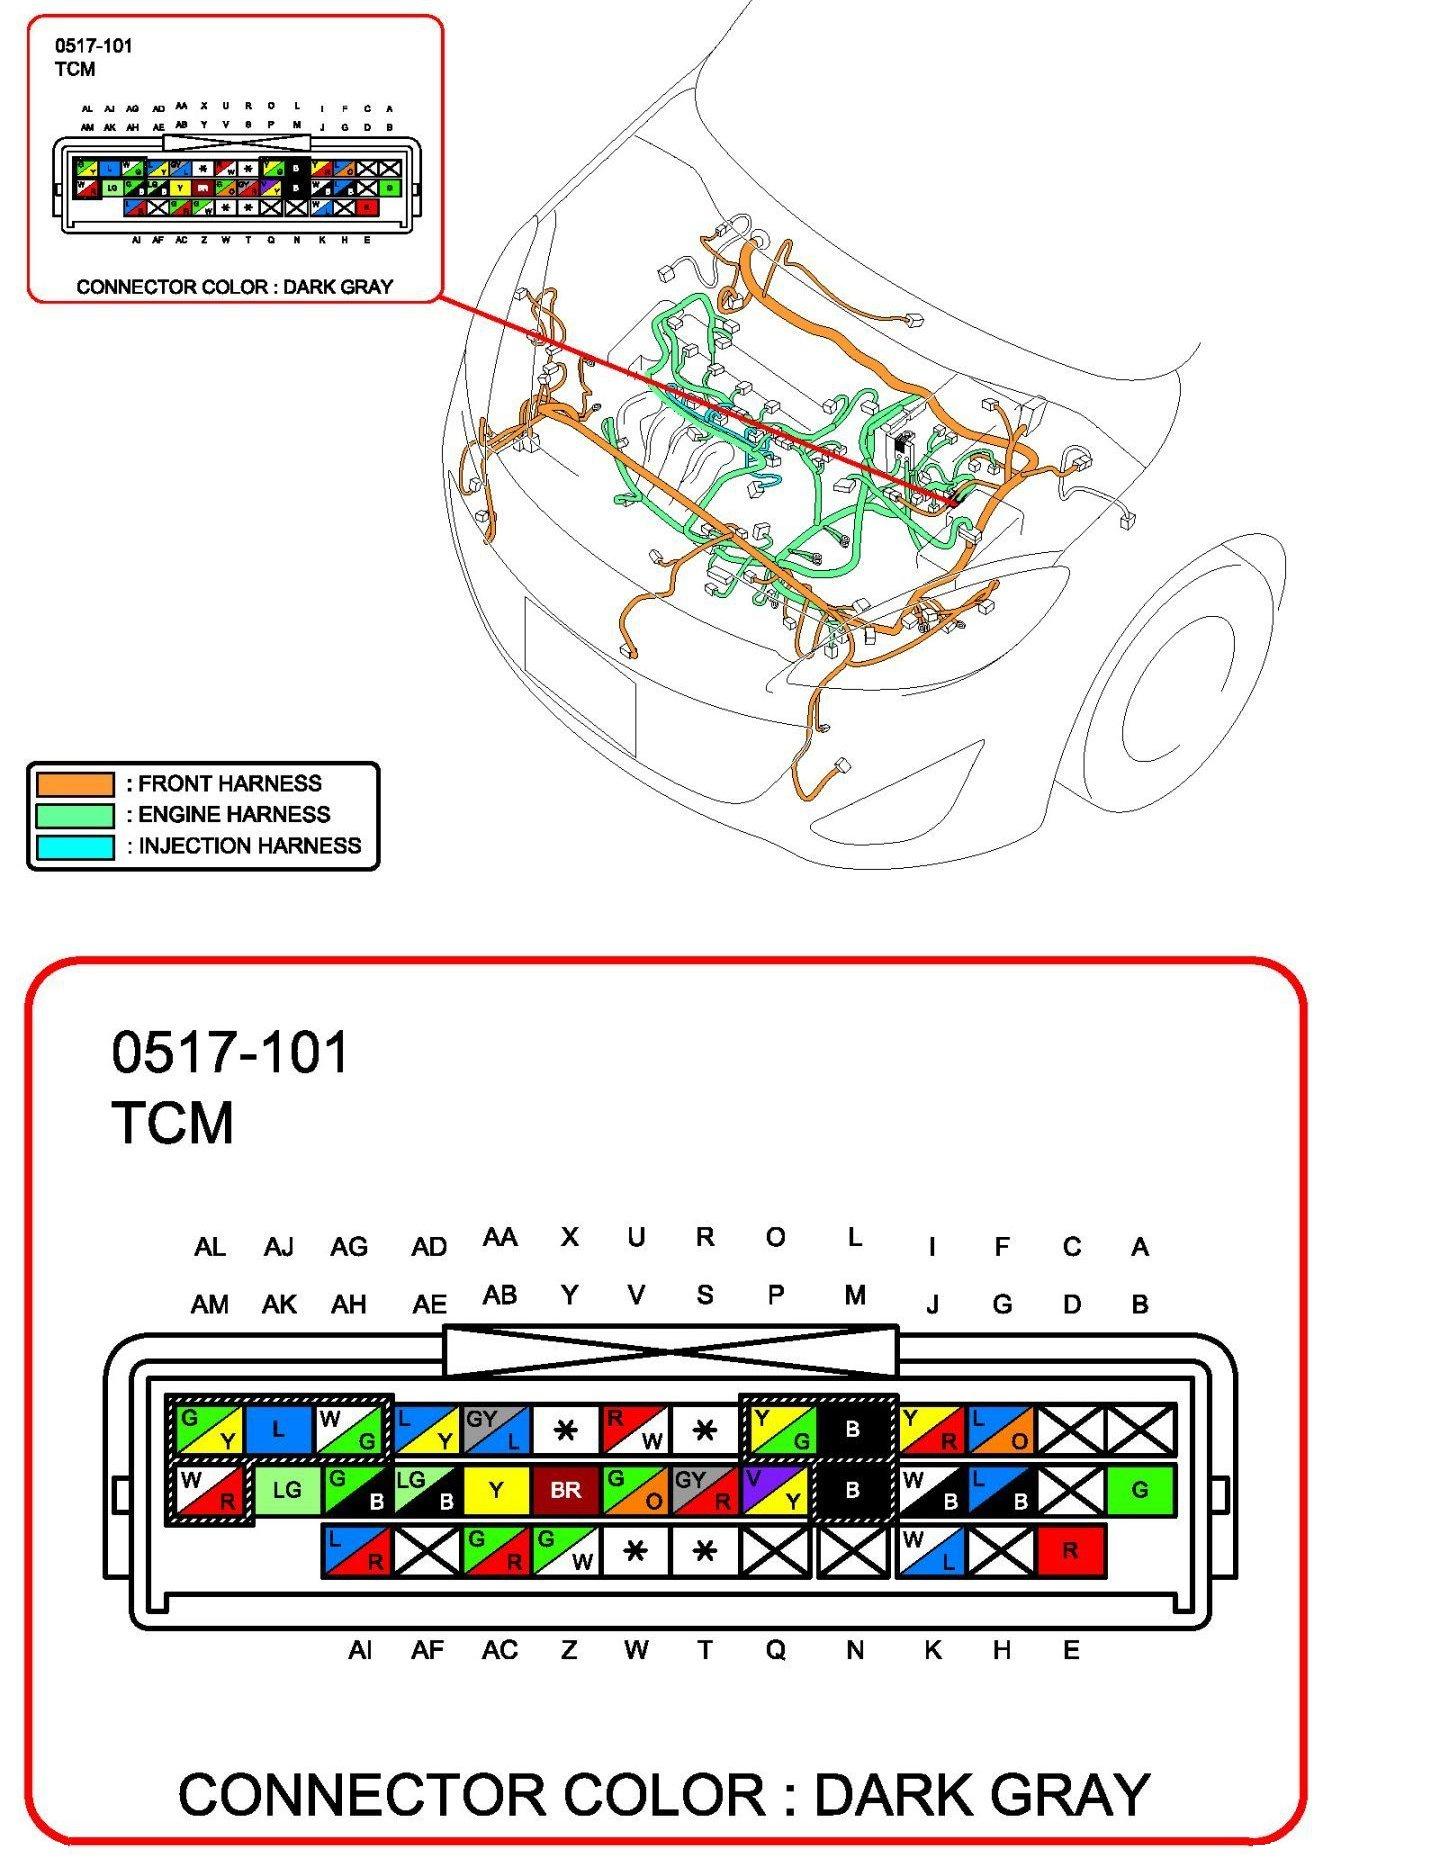 Mazda Navigation Wiring Diagram : Installing a din navigation system to mazda